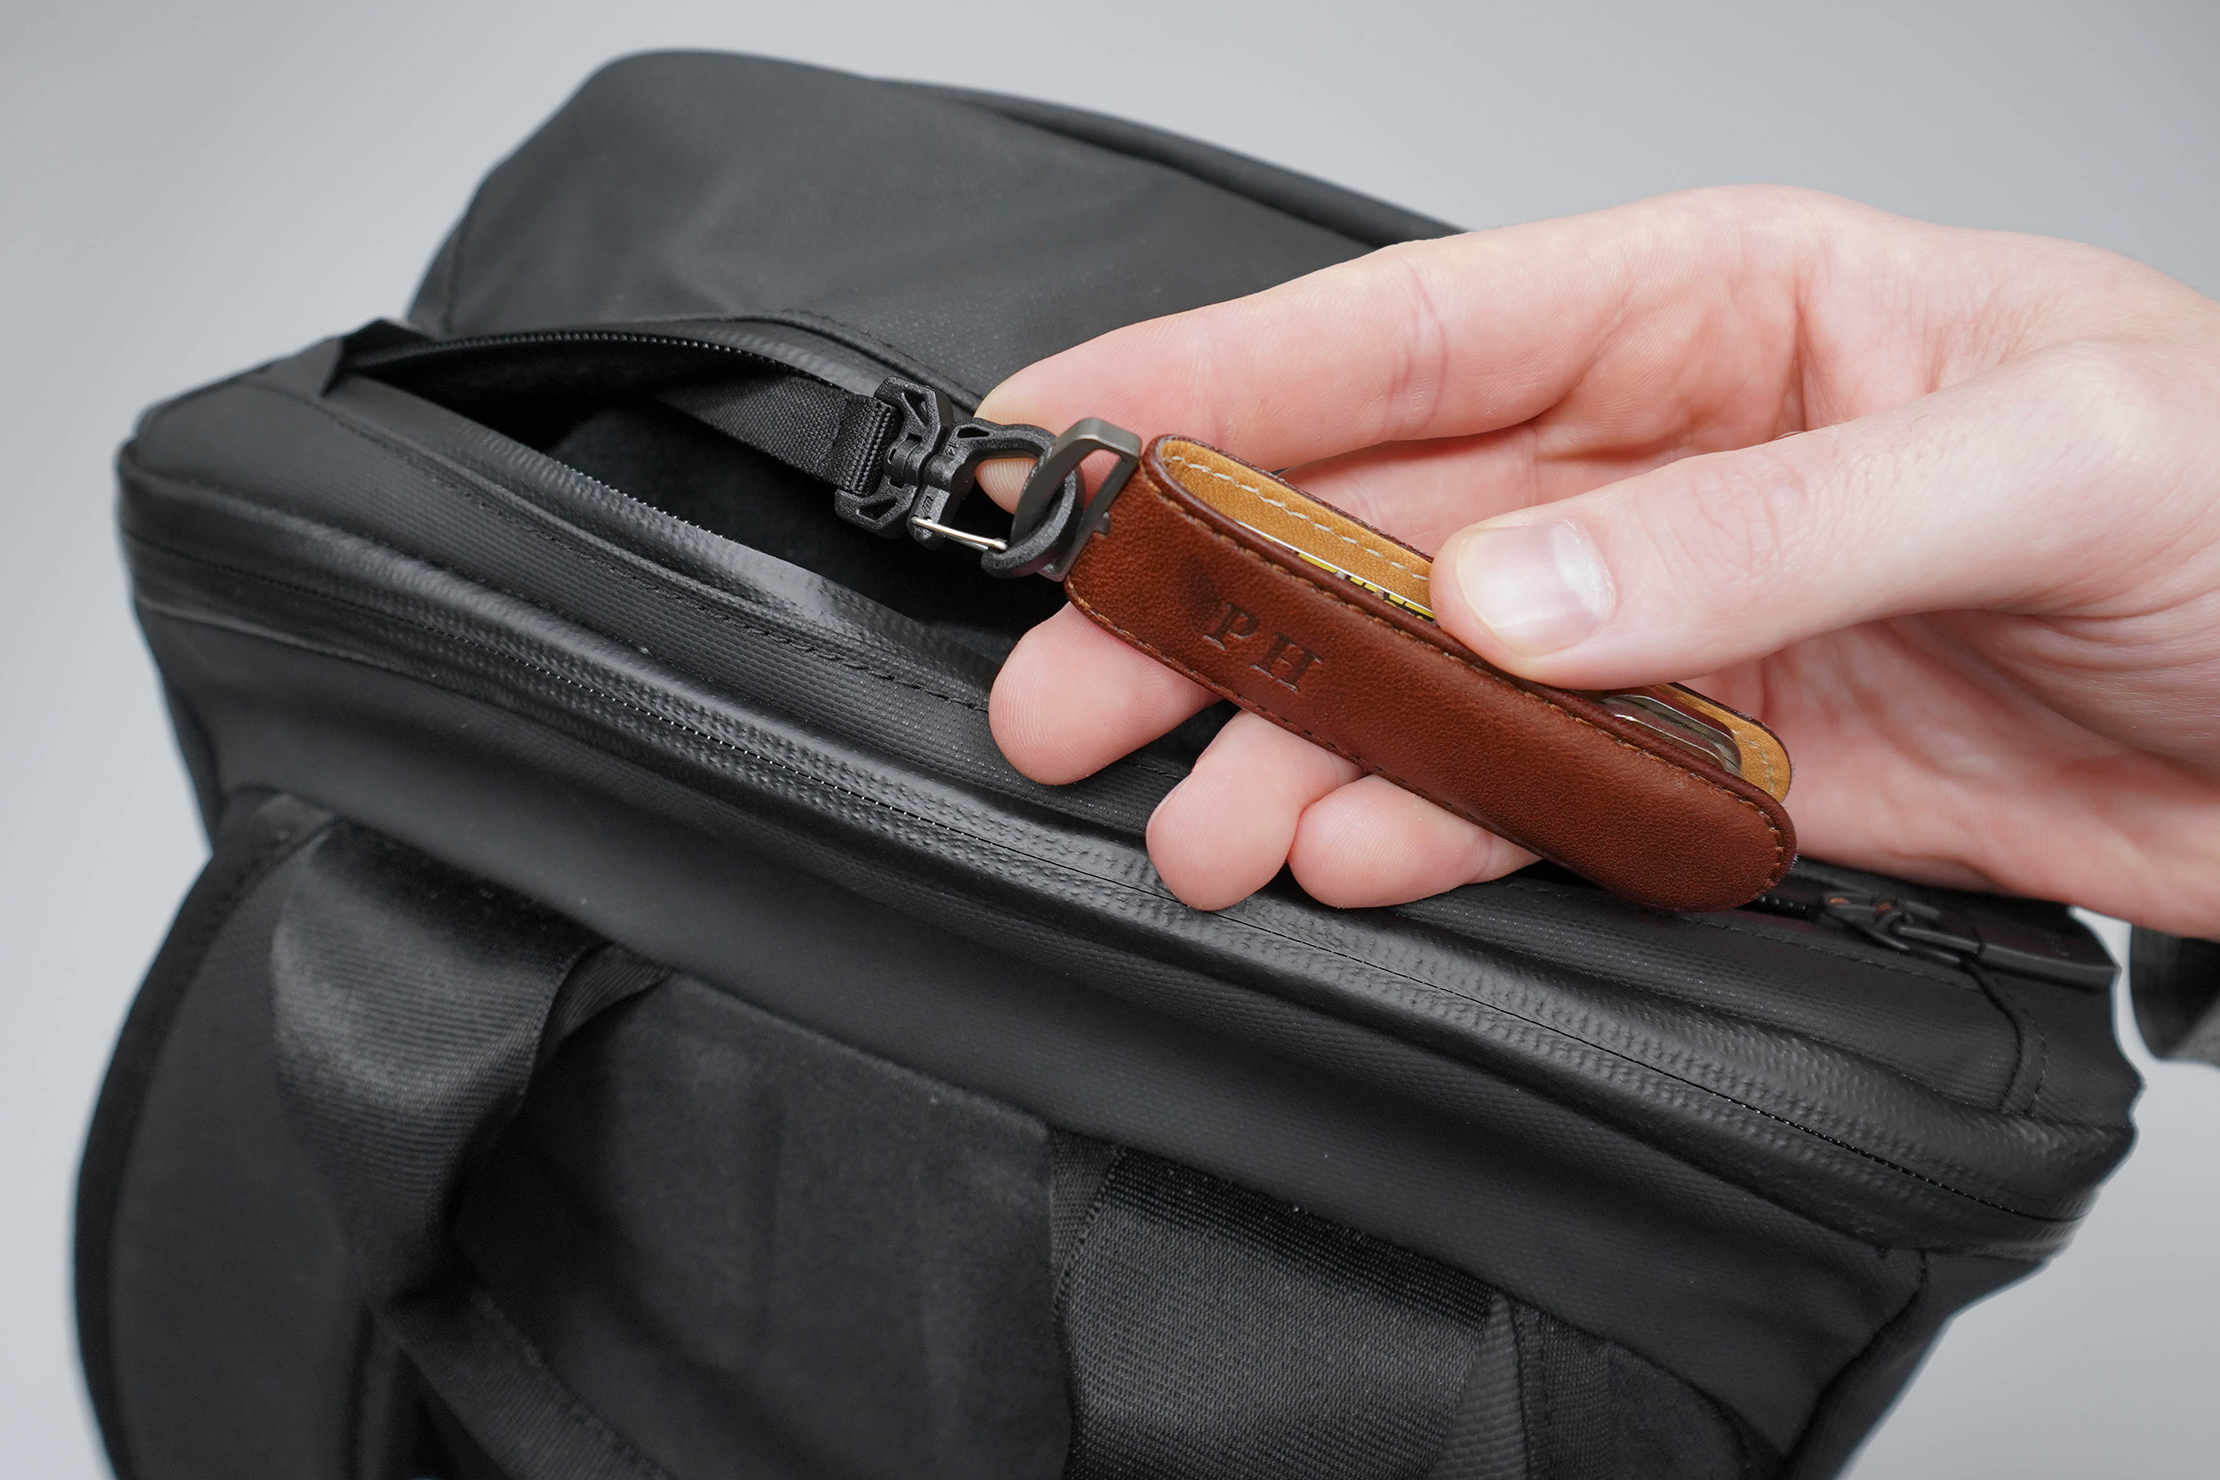 WANDRD DUO Daypack Key Clip